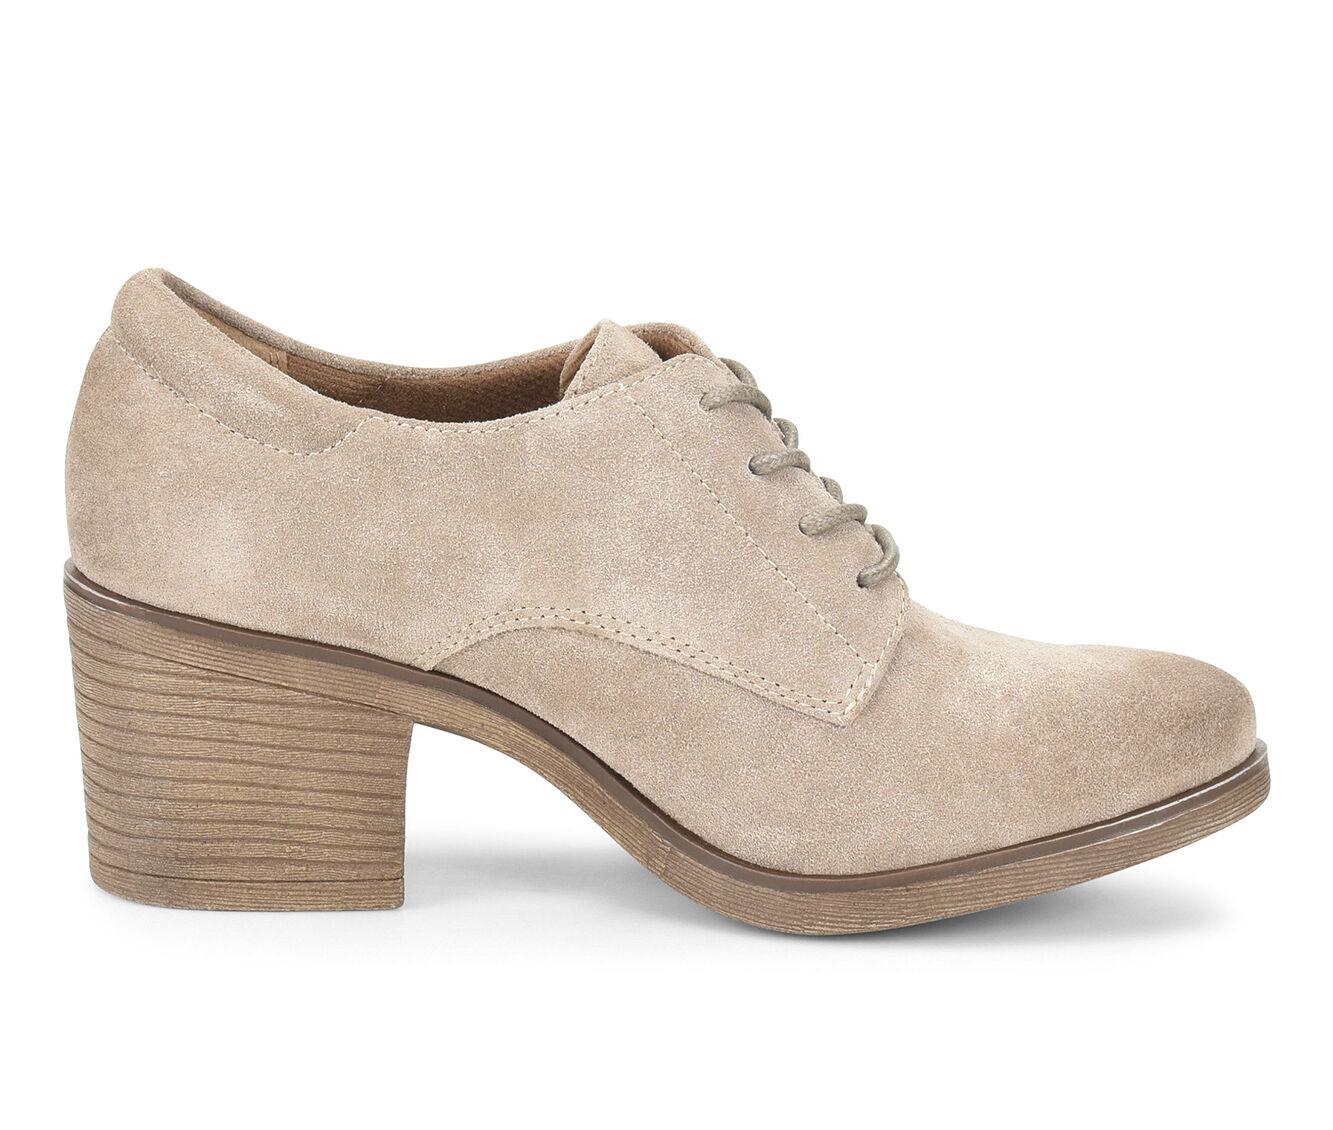 uk shoes_kd6455